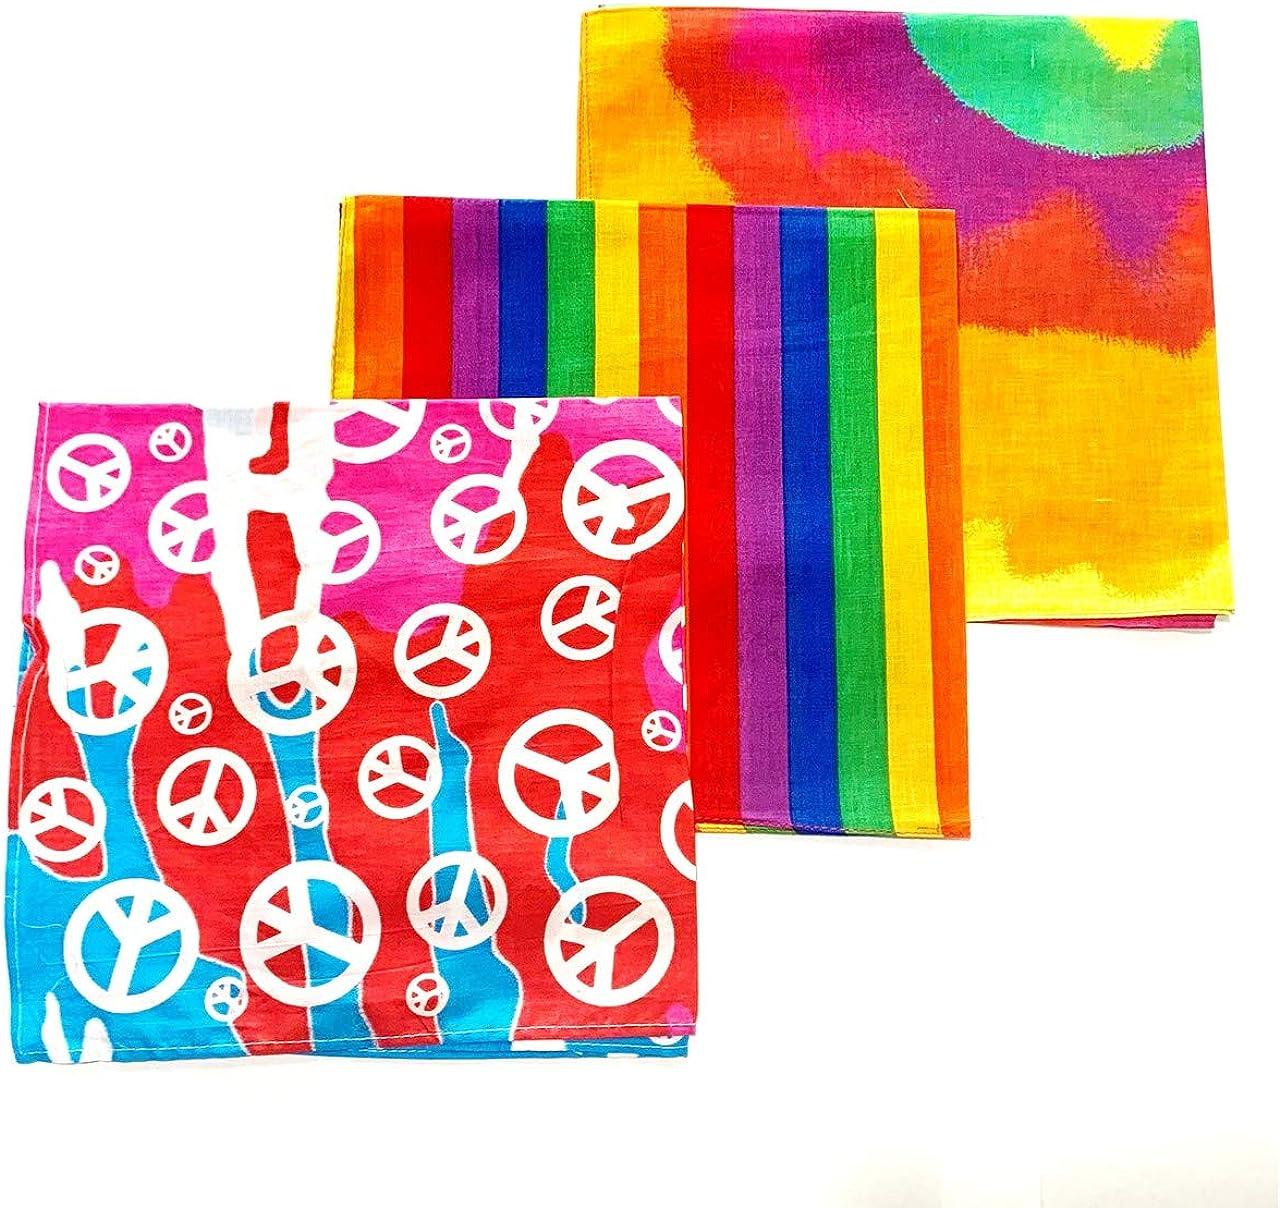 3 Pack of Bright Rainbow Bandanas Headband Gay Pride Love Funky Hipster Wrist Band